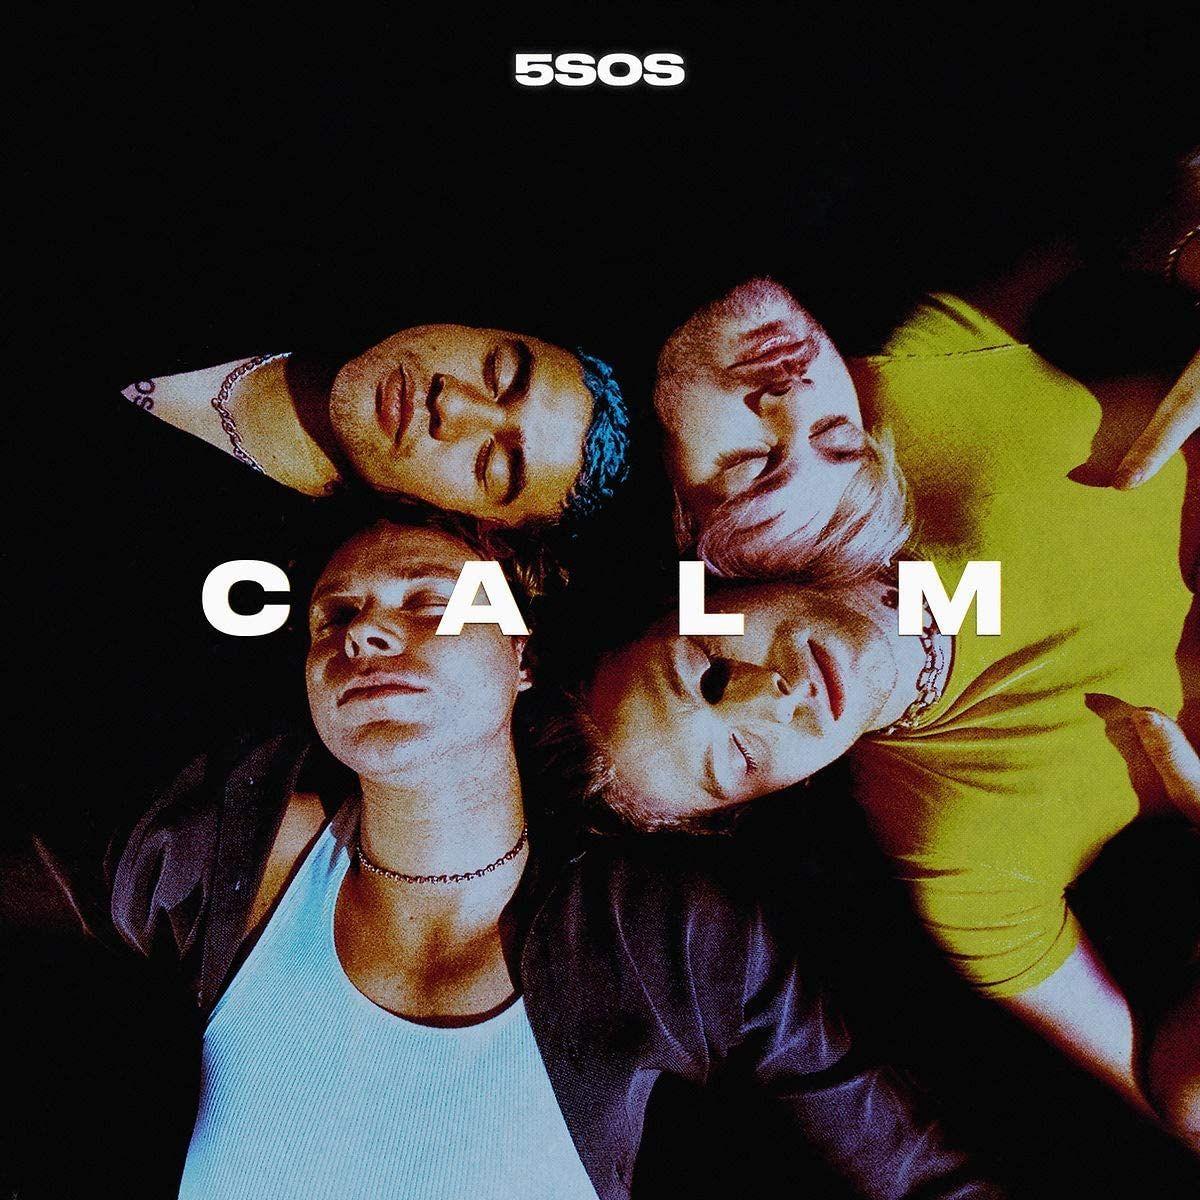 5 Seconds of Summer - CALM (Vinyl) - 1